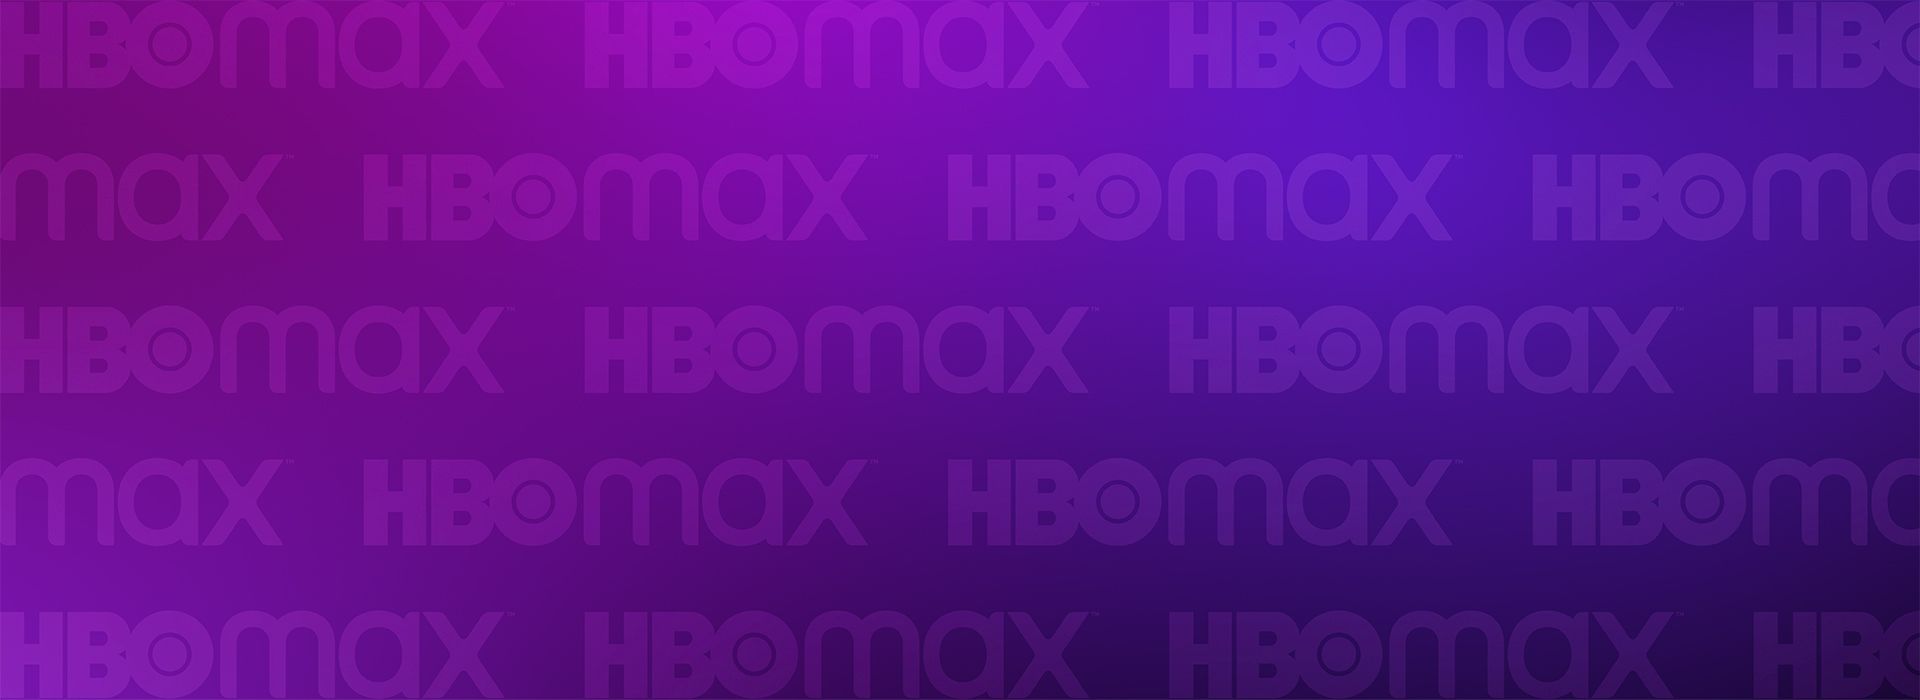 HBO Max Hero Image 04